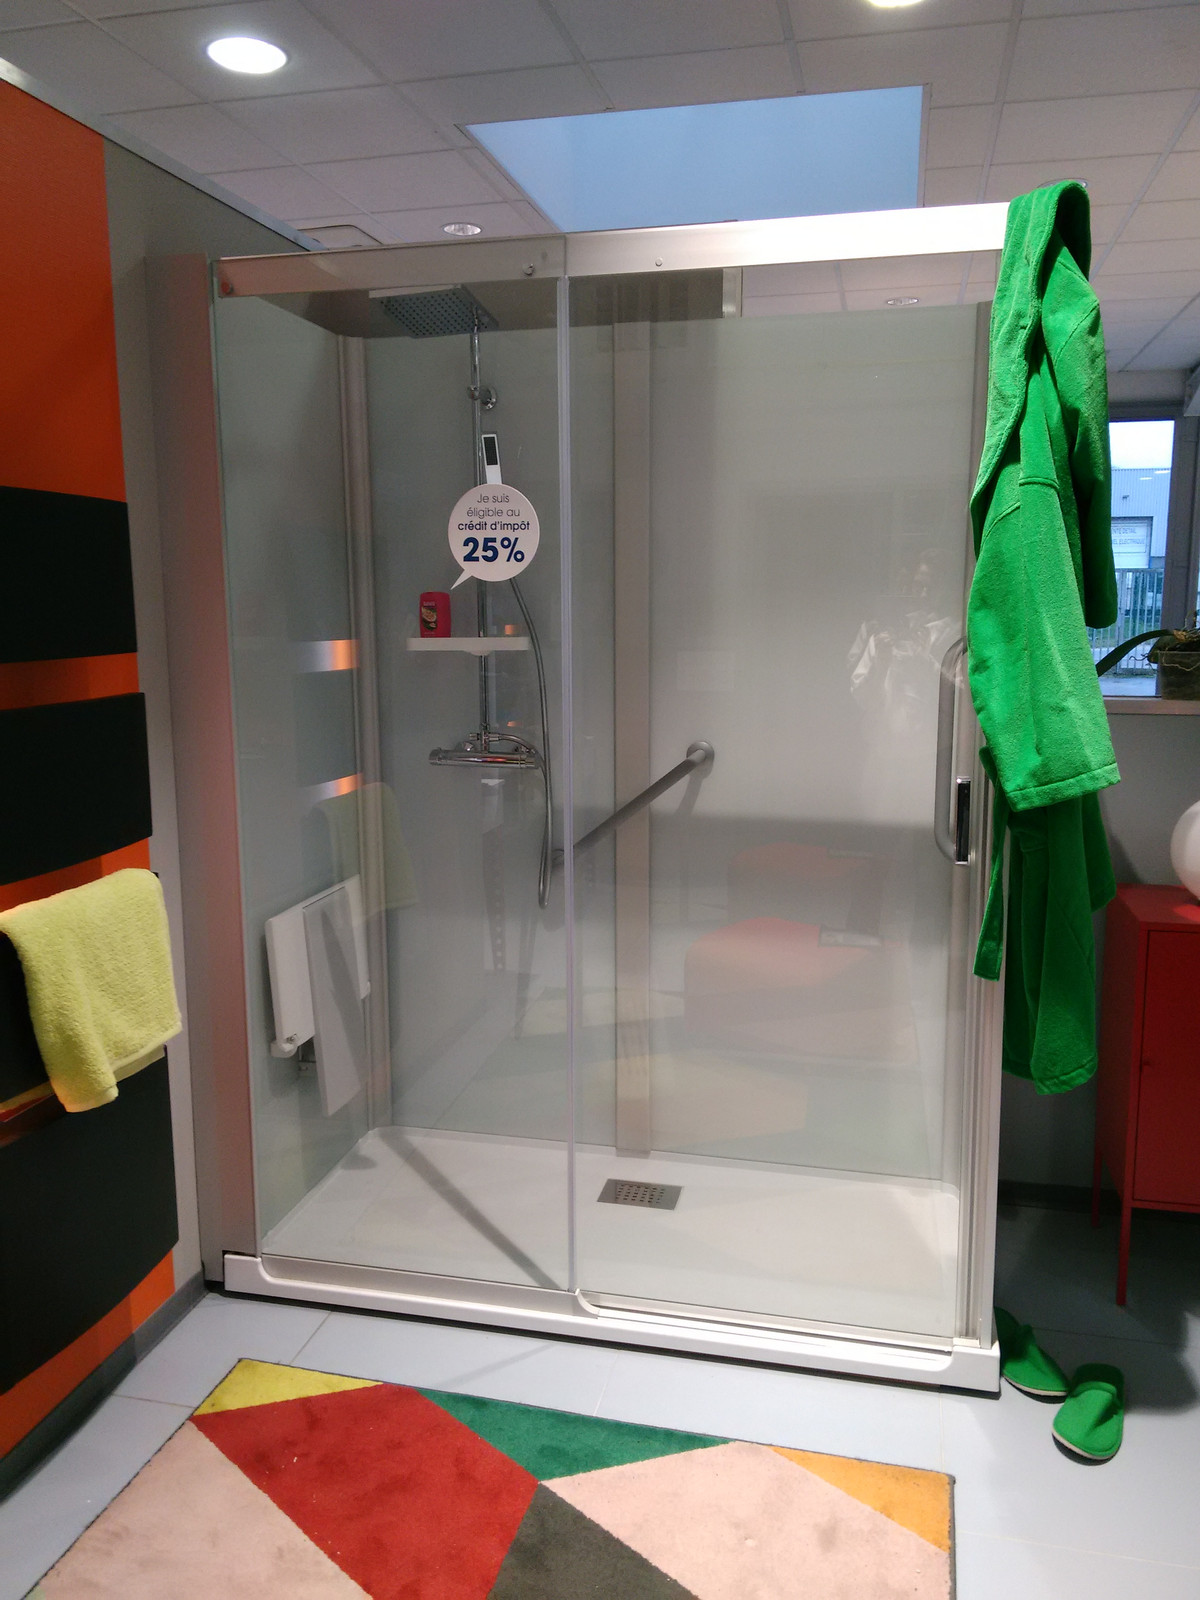 Etagere Salle De Bain Ikea ~ Kinemagic S R Nit 160×80 1900 Euros Ttc Vf Confort Salle De